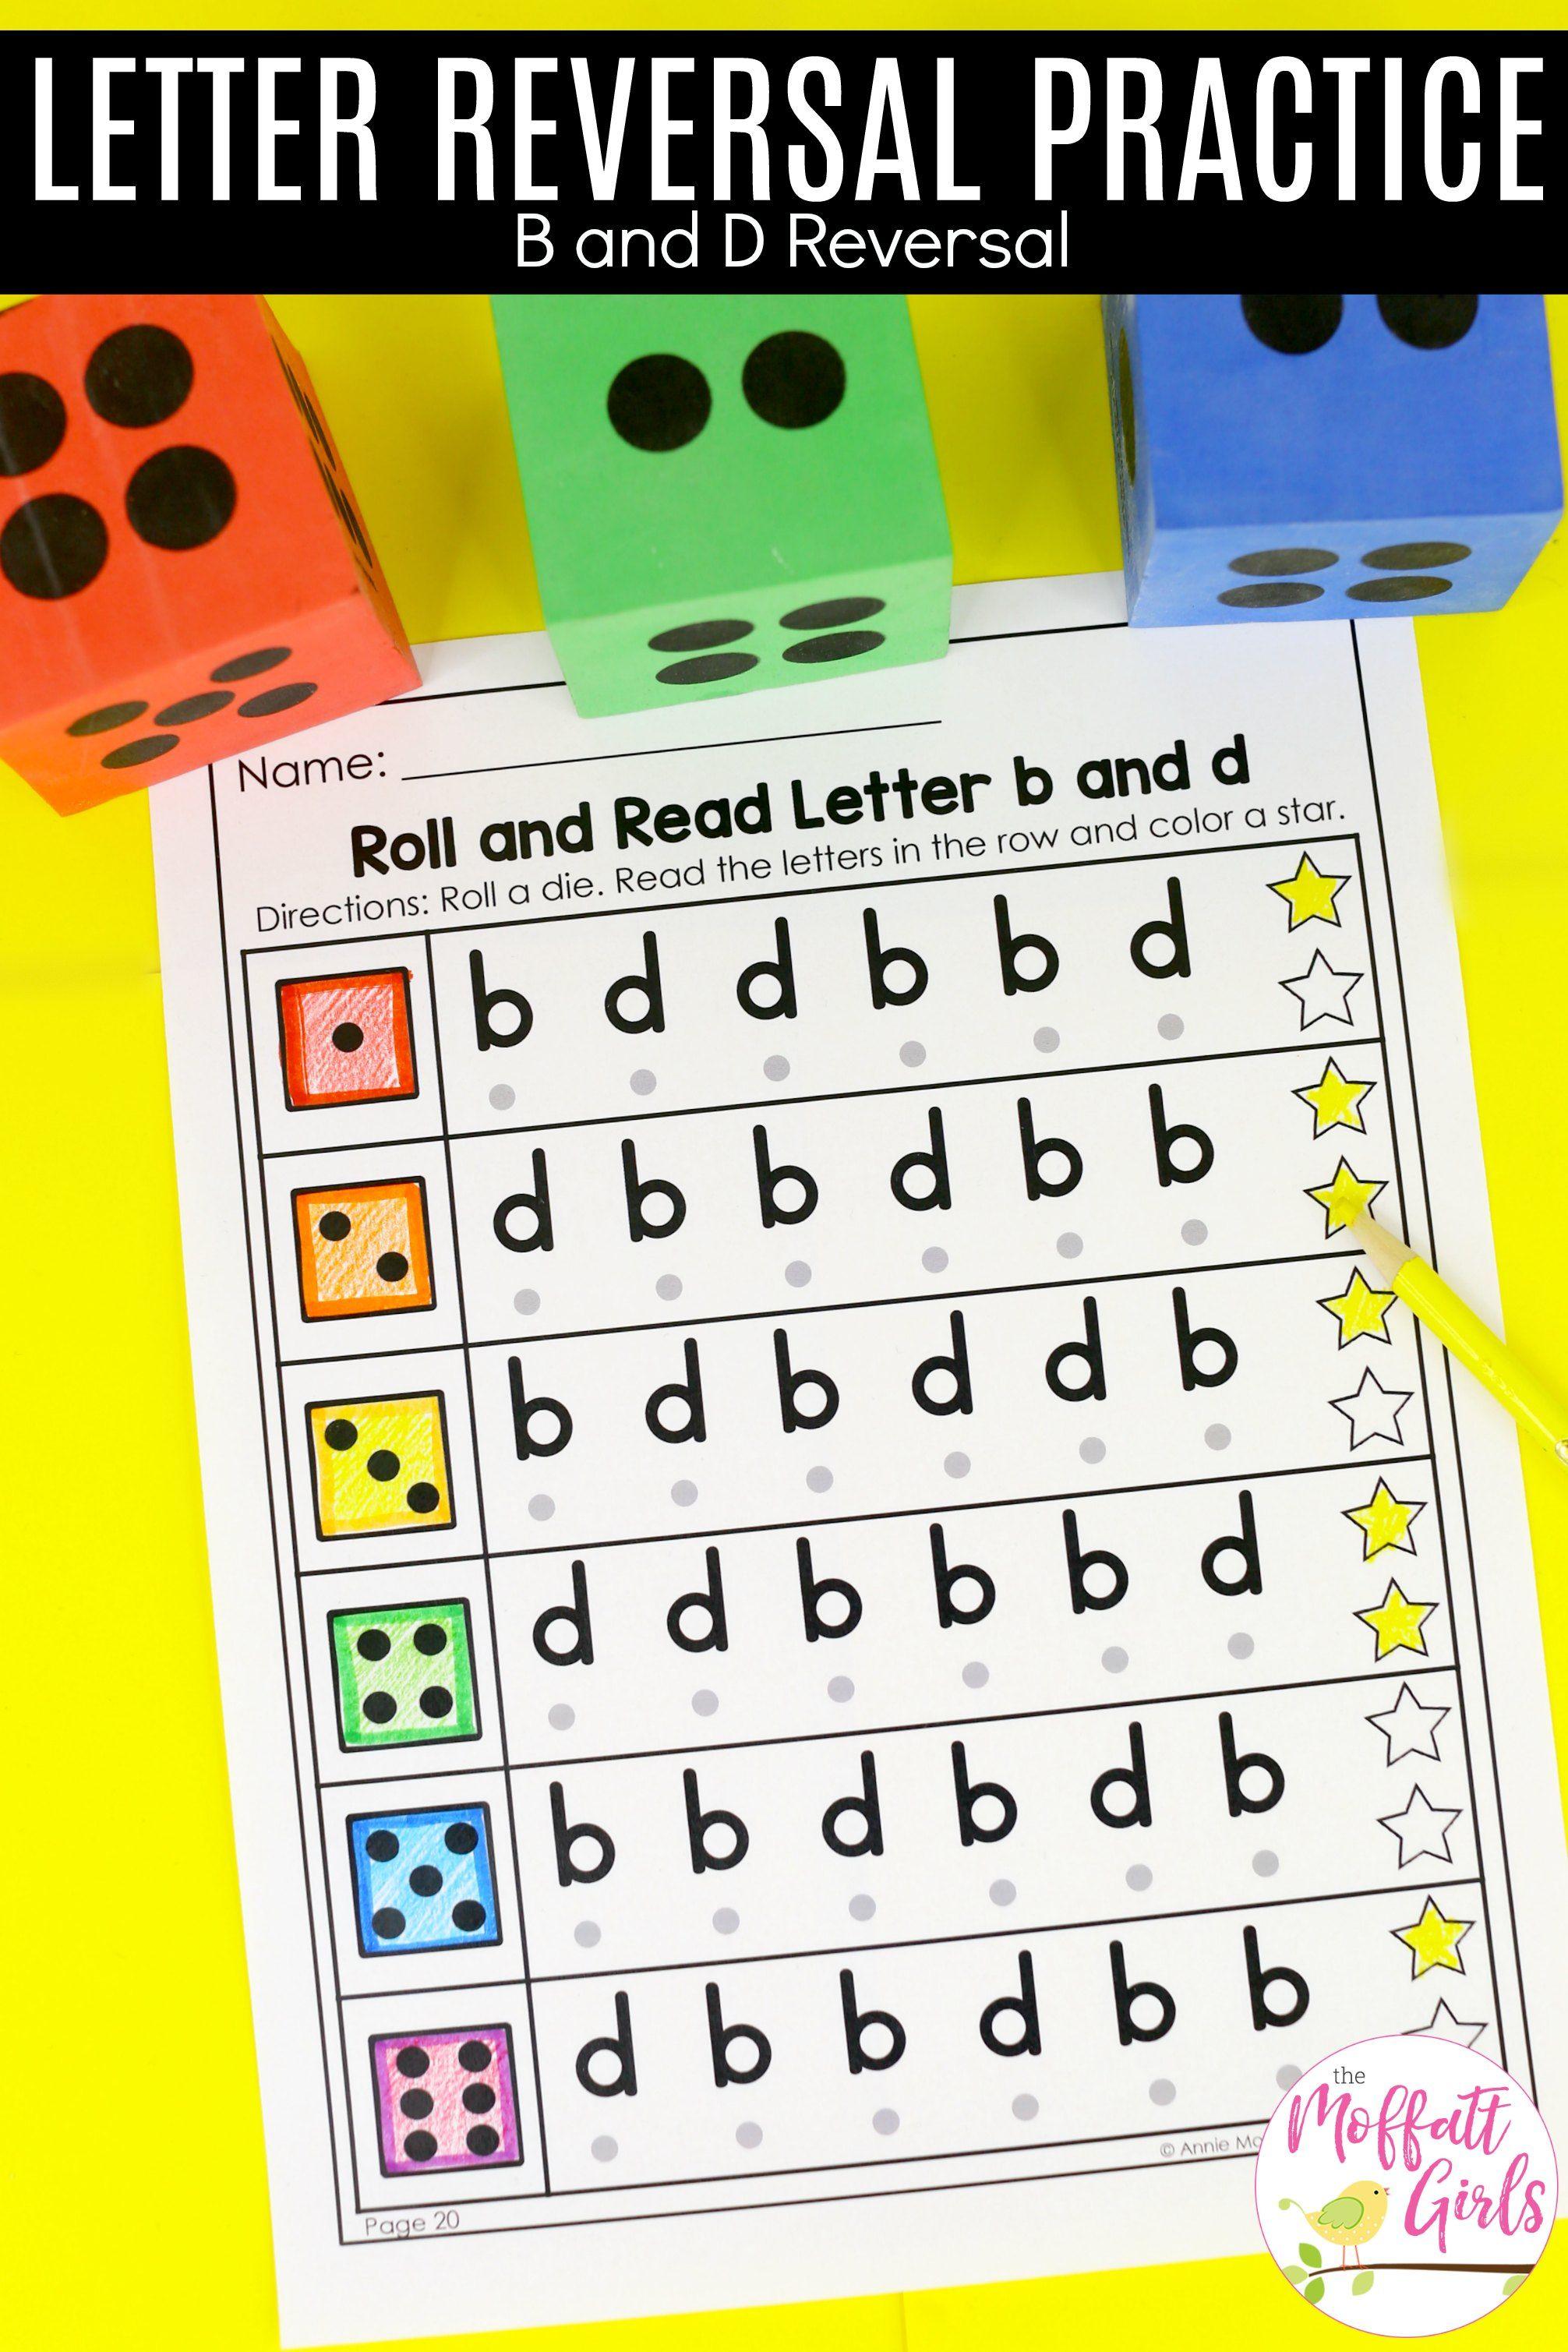 Letter Reversal Practice In